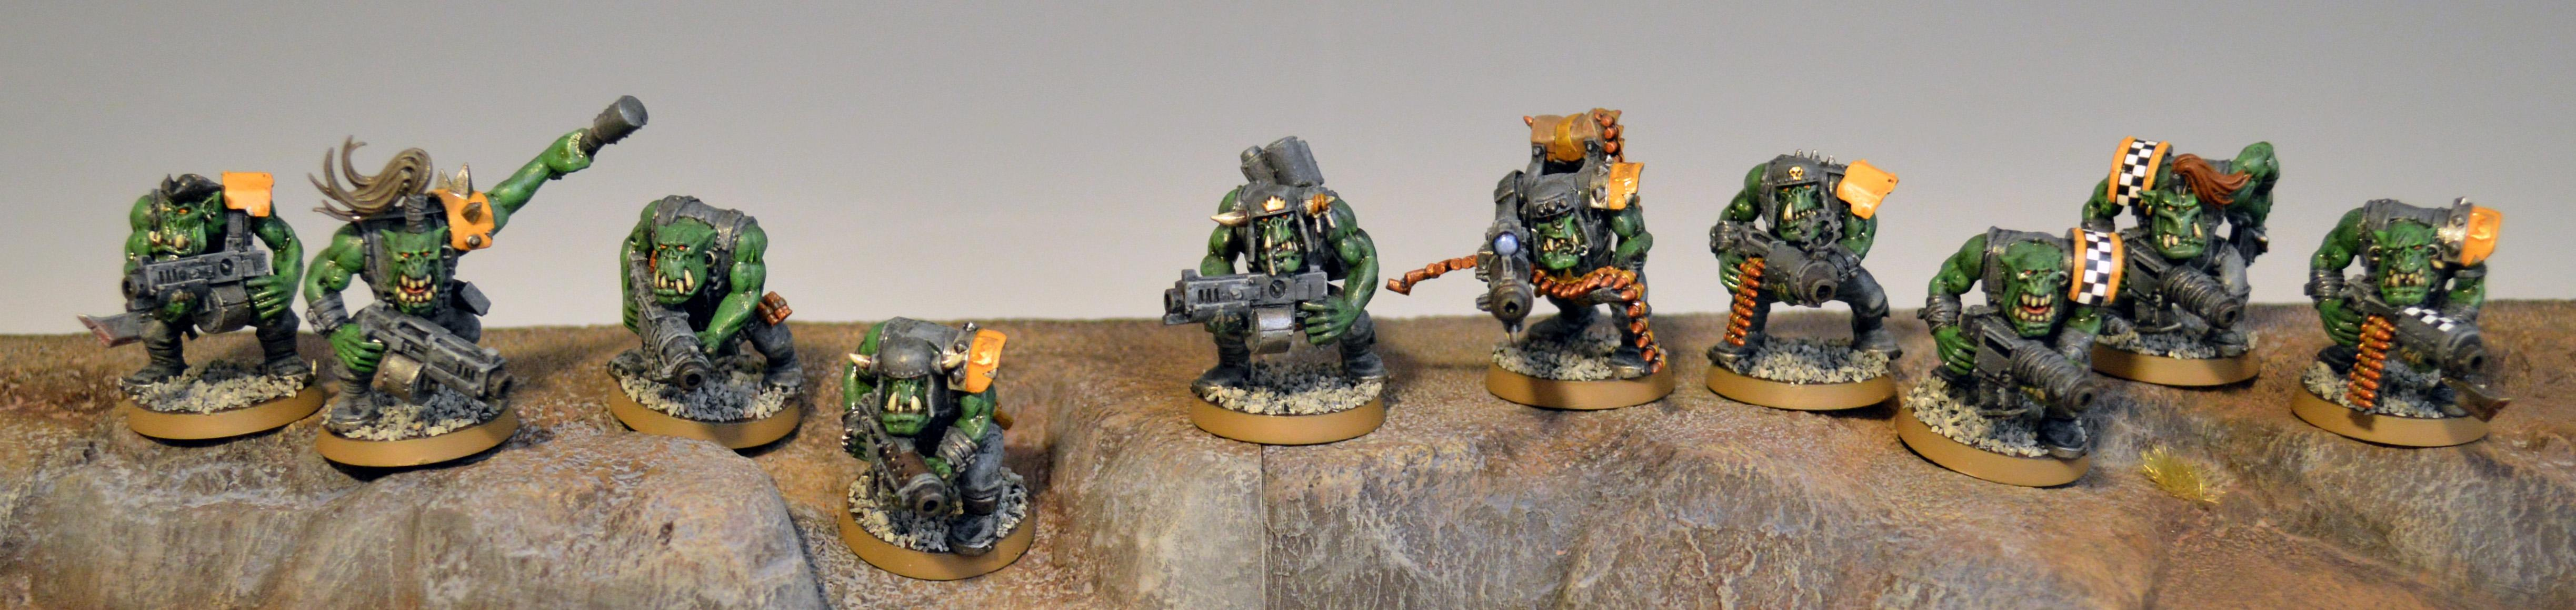 Boy, Orks, Shoota Boyz 4